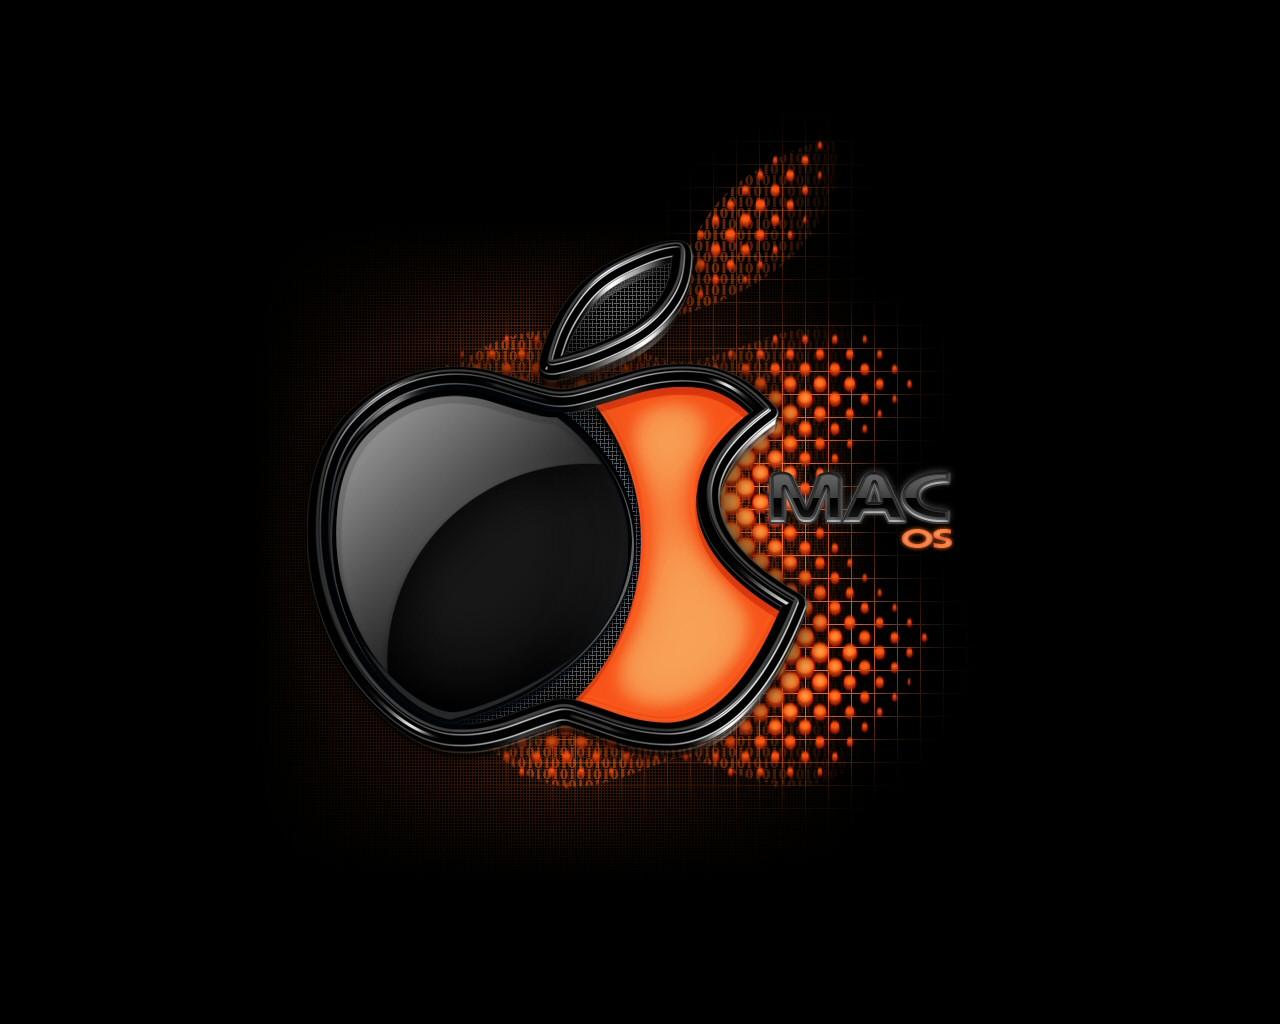 apple wallpaper hd 1080p apple mac wallpapers hd 1280x1024